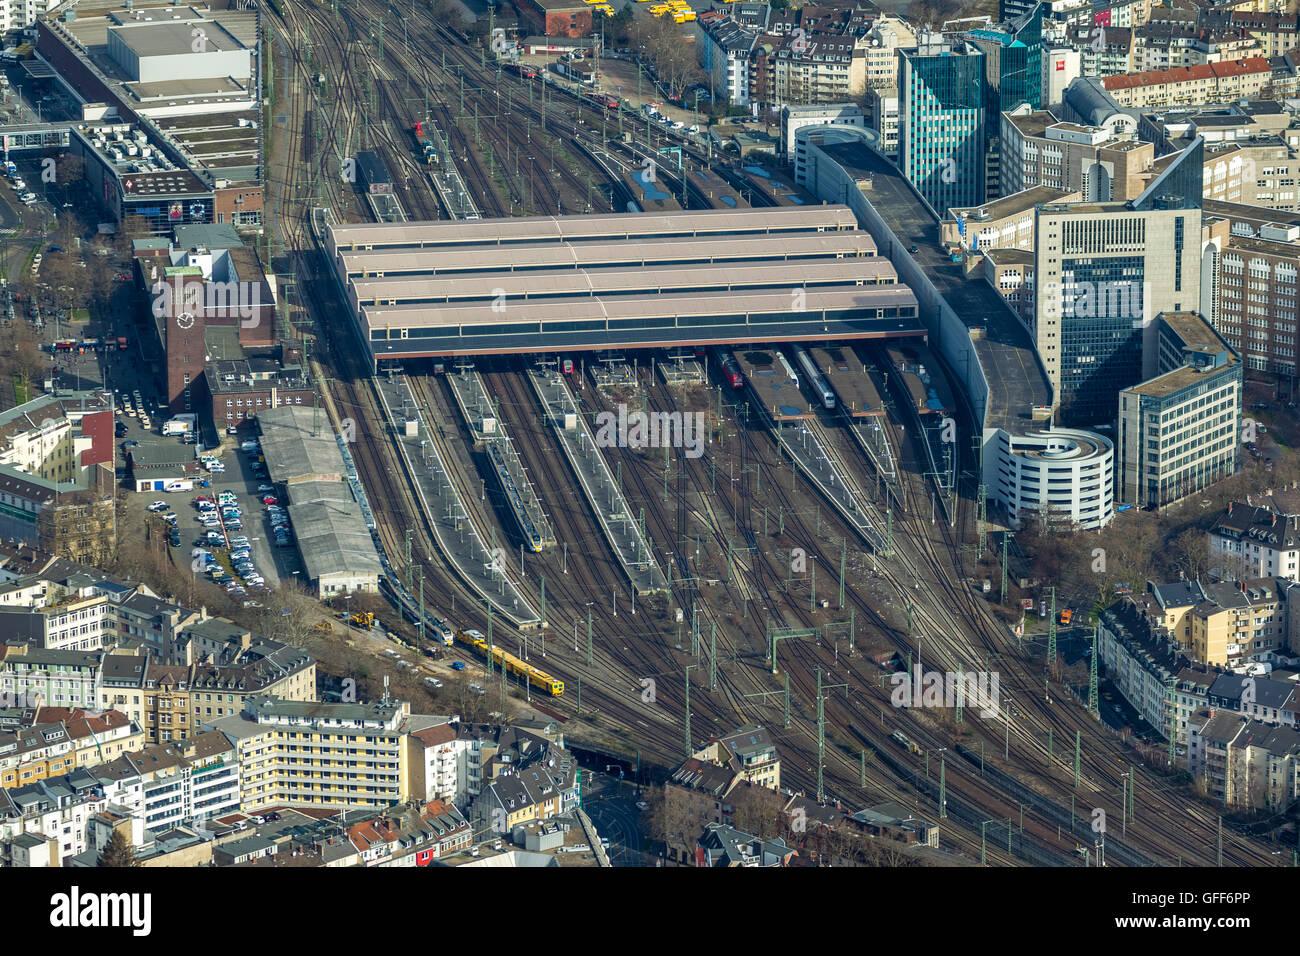 Aerial view, main station Düsseldorf, Duesseldorf, Rhineland, North Rhine Westphalia, Germany, Europe, Aerial - Stock Image